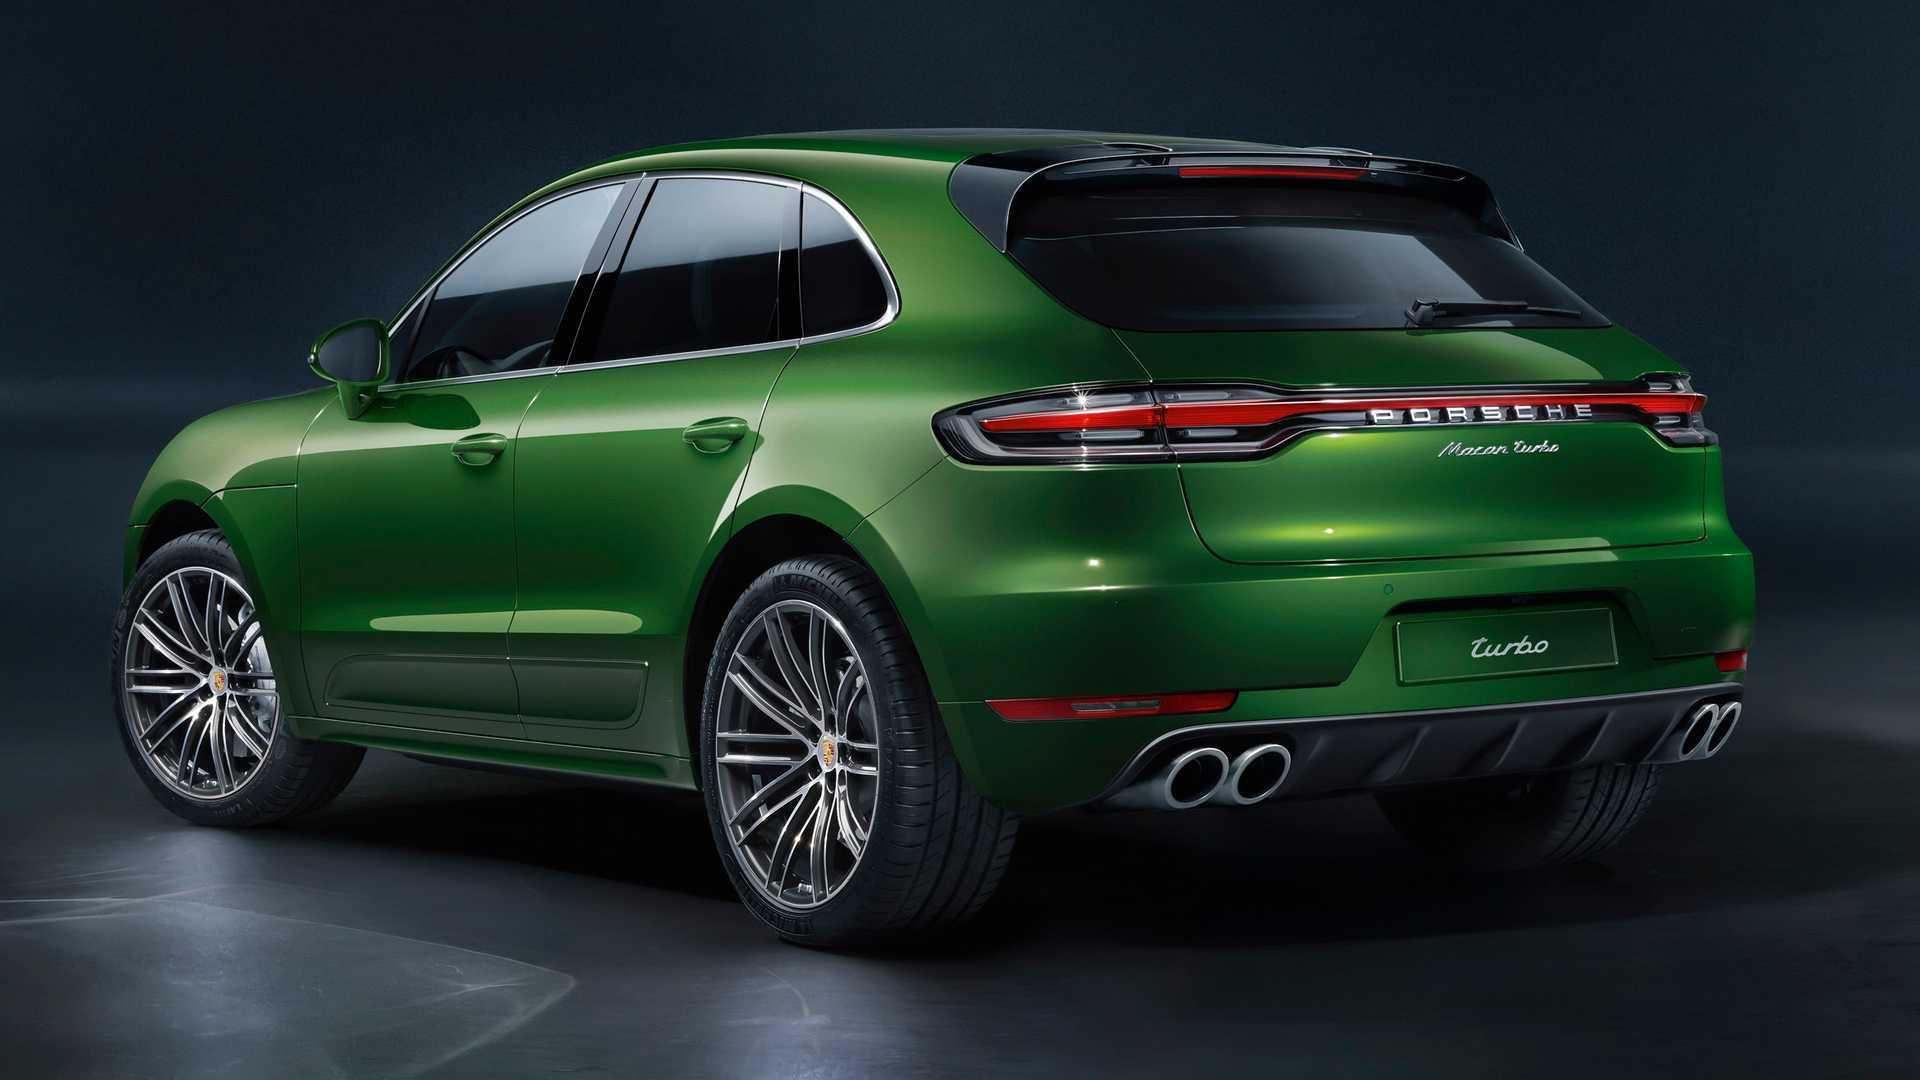 2020 Porsche Macan Rumors, New Design, Specs, Price >> 2020 Porsche Macan Turbo Is A 435 Hp Sports Car Masquerading